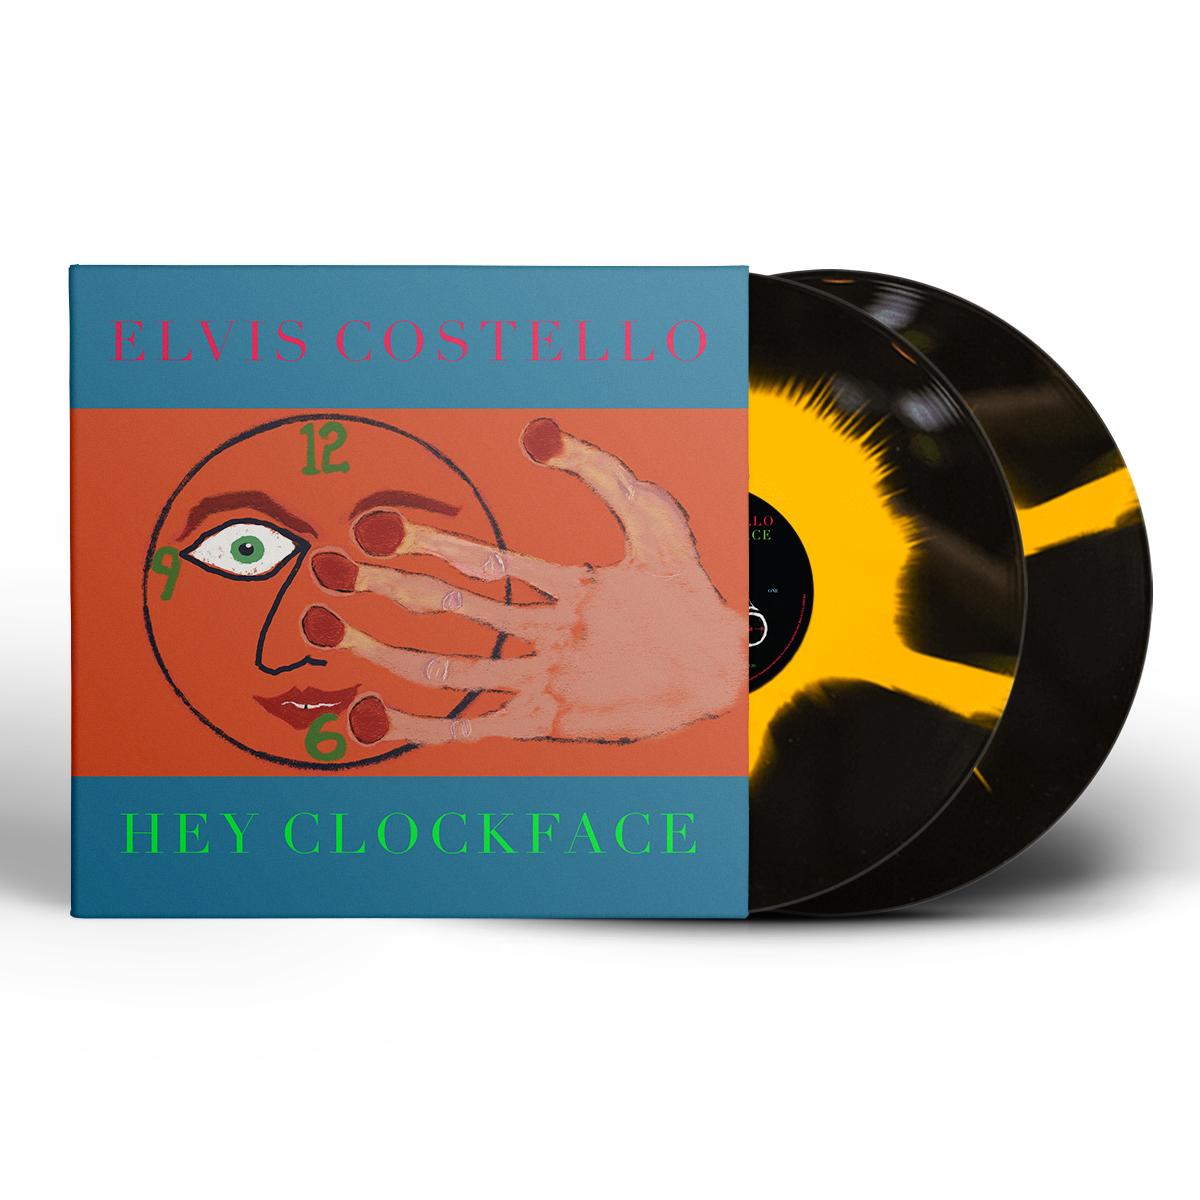 Signed Eclipse Vinyl 2xLP or CD Merch Essentials Bundle